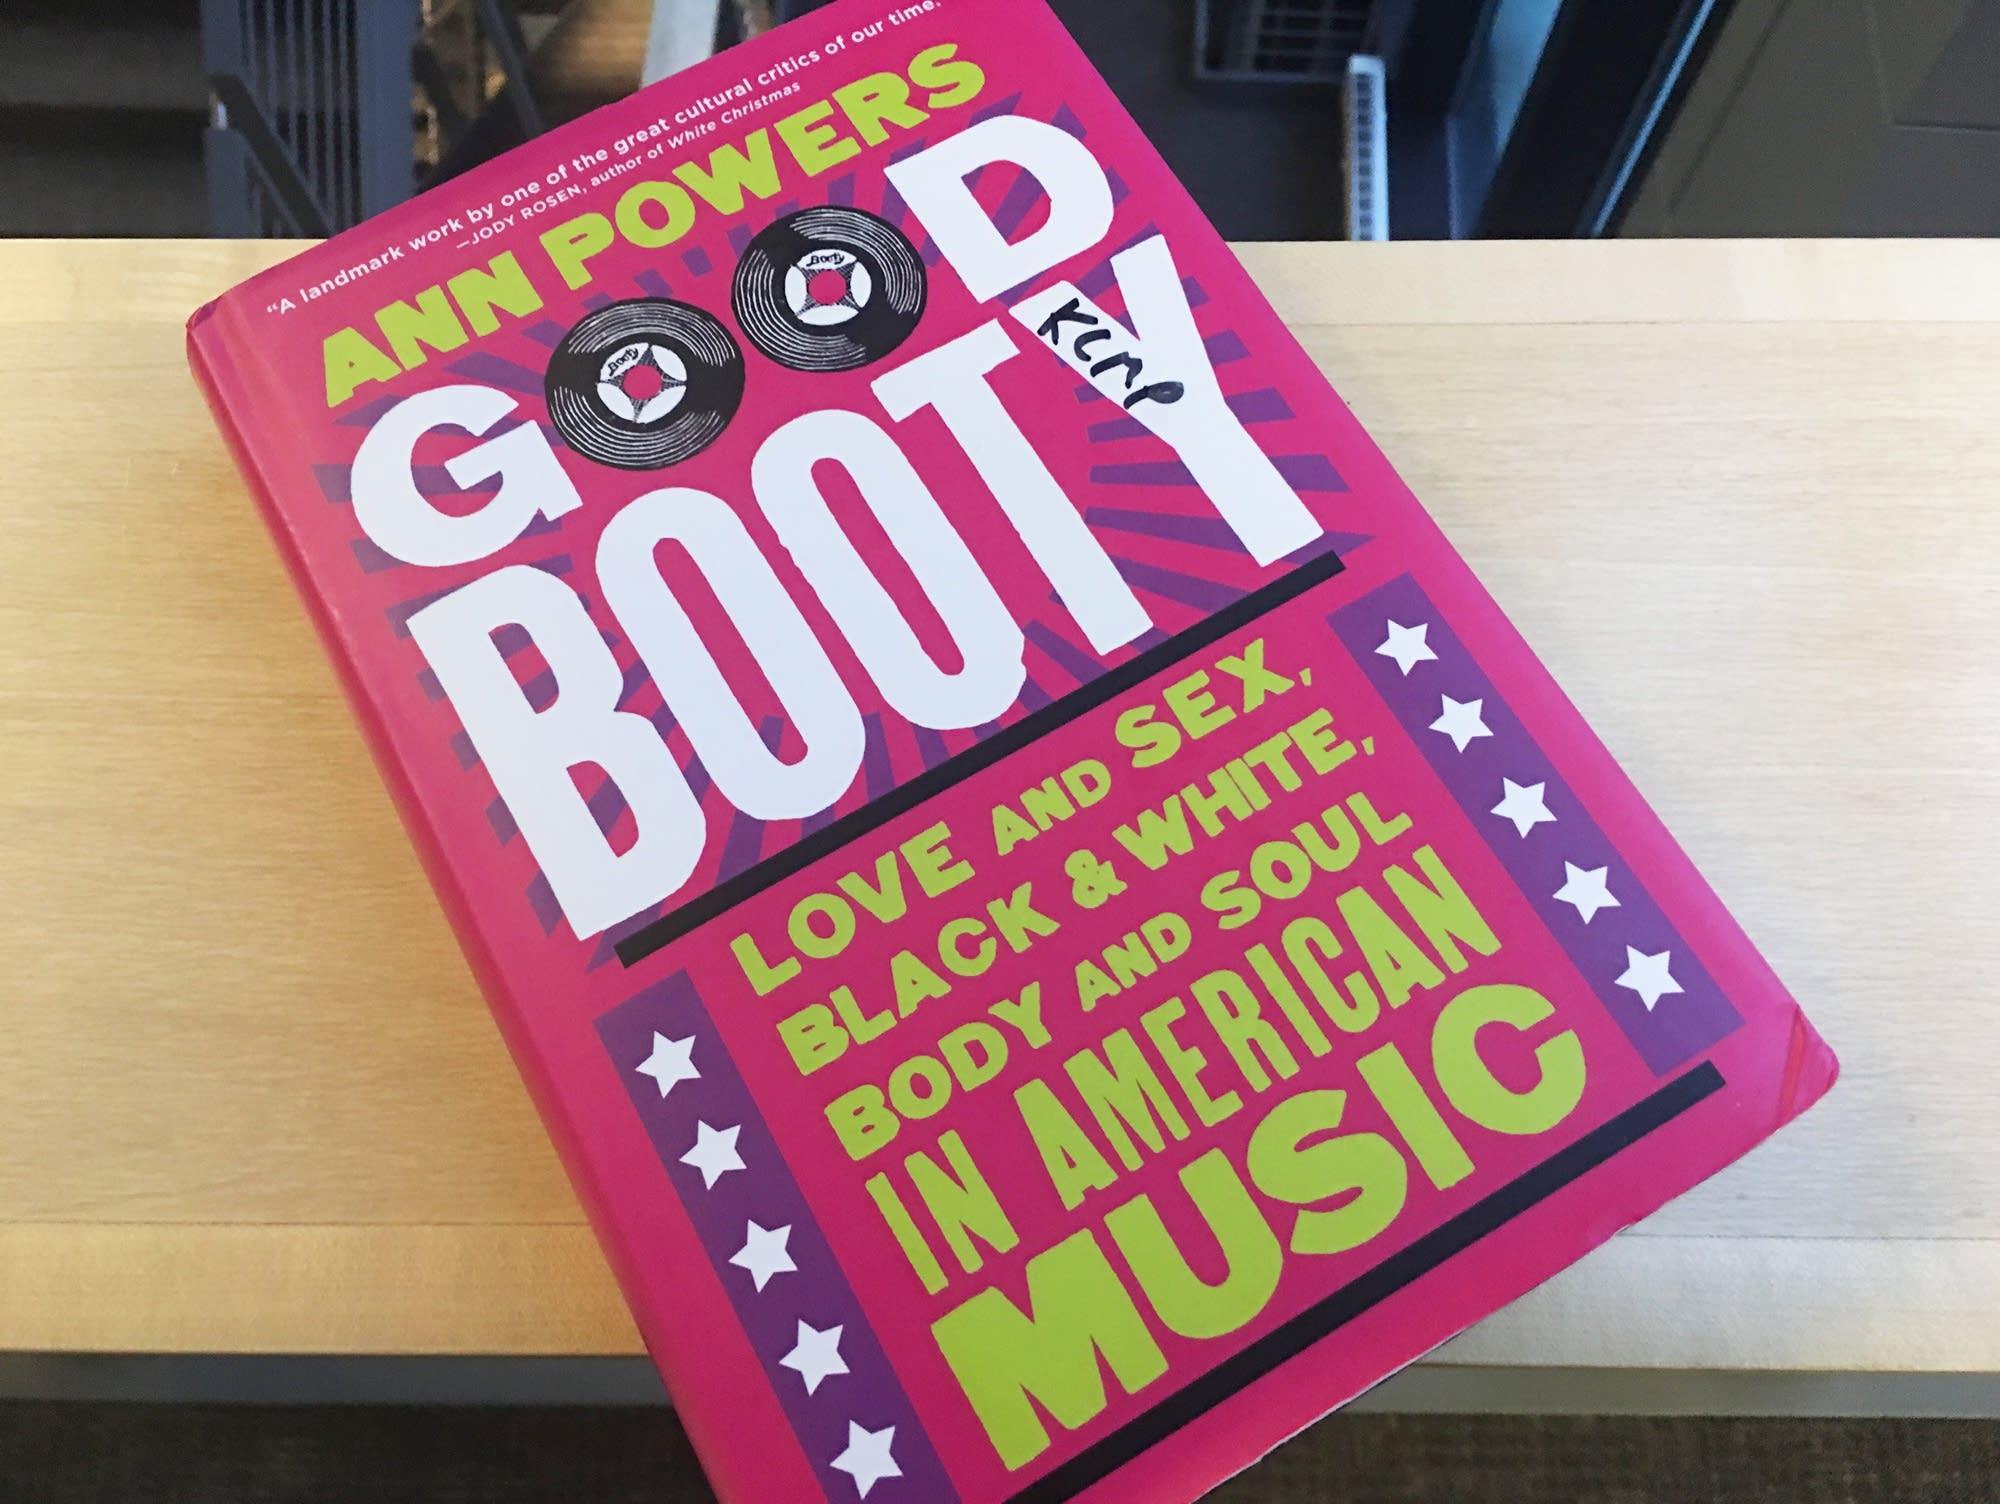 Ann Powers's book 'Good Booty.'